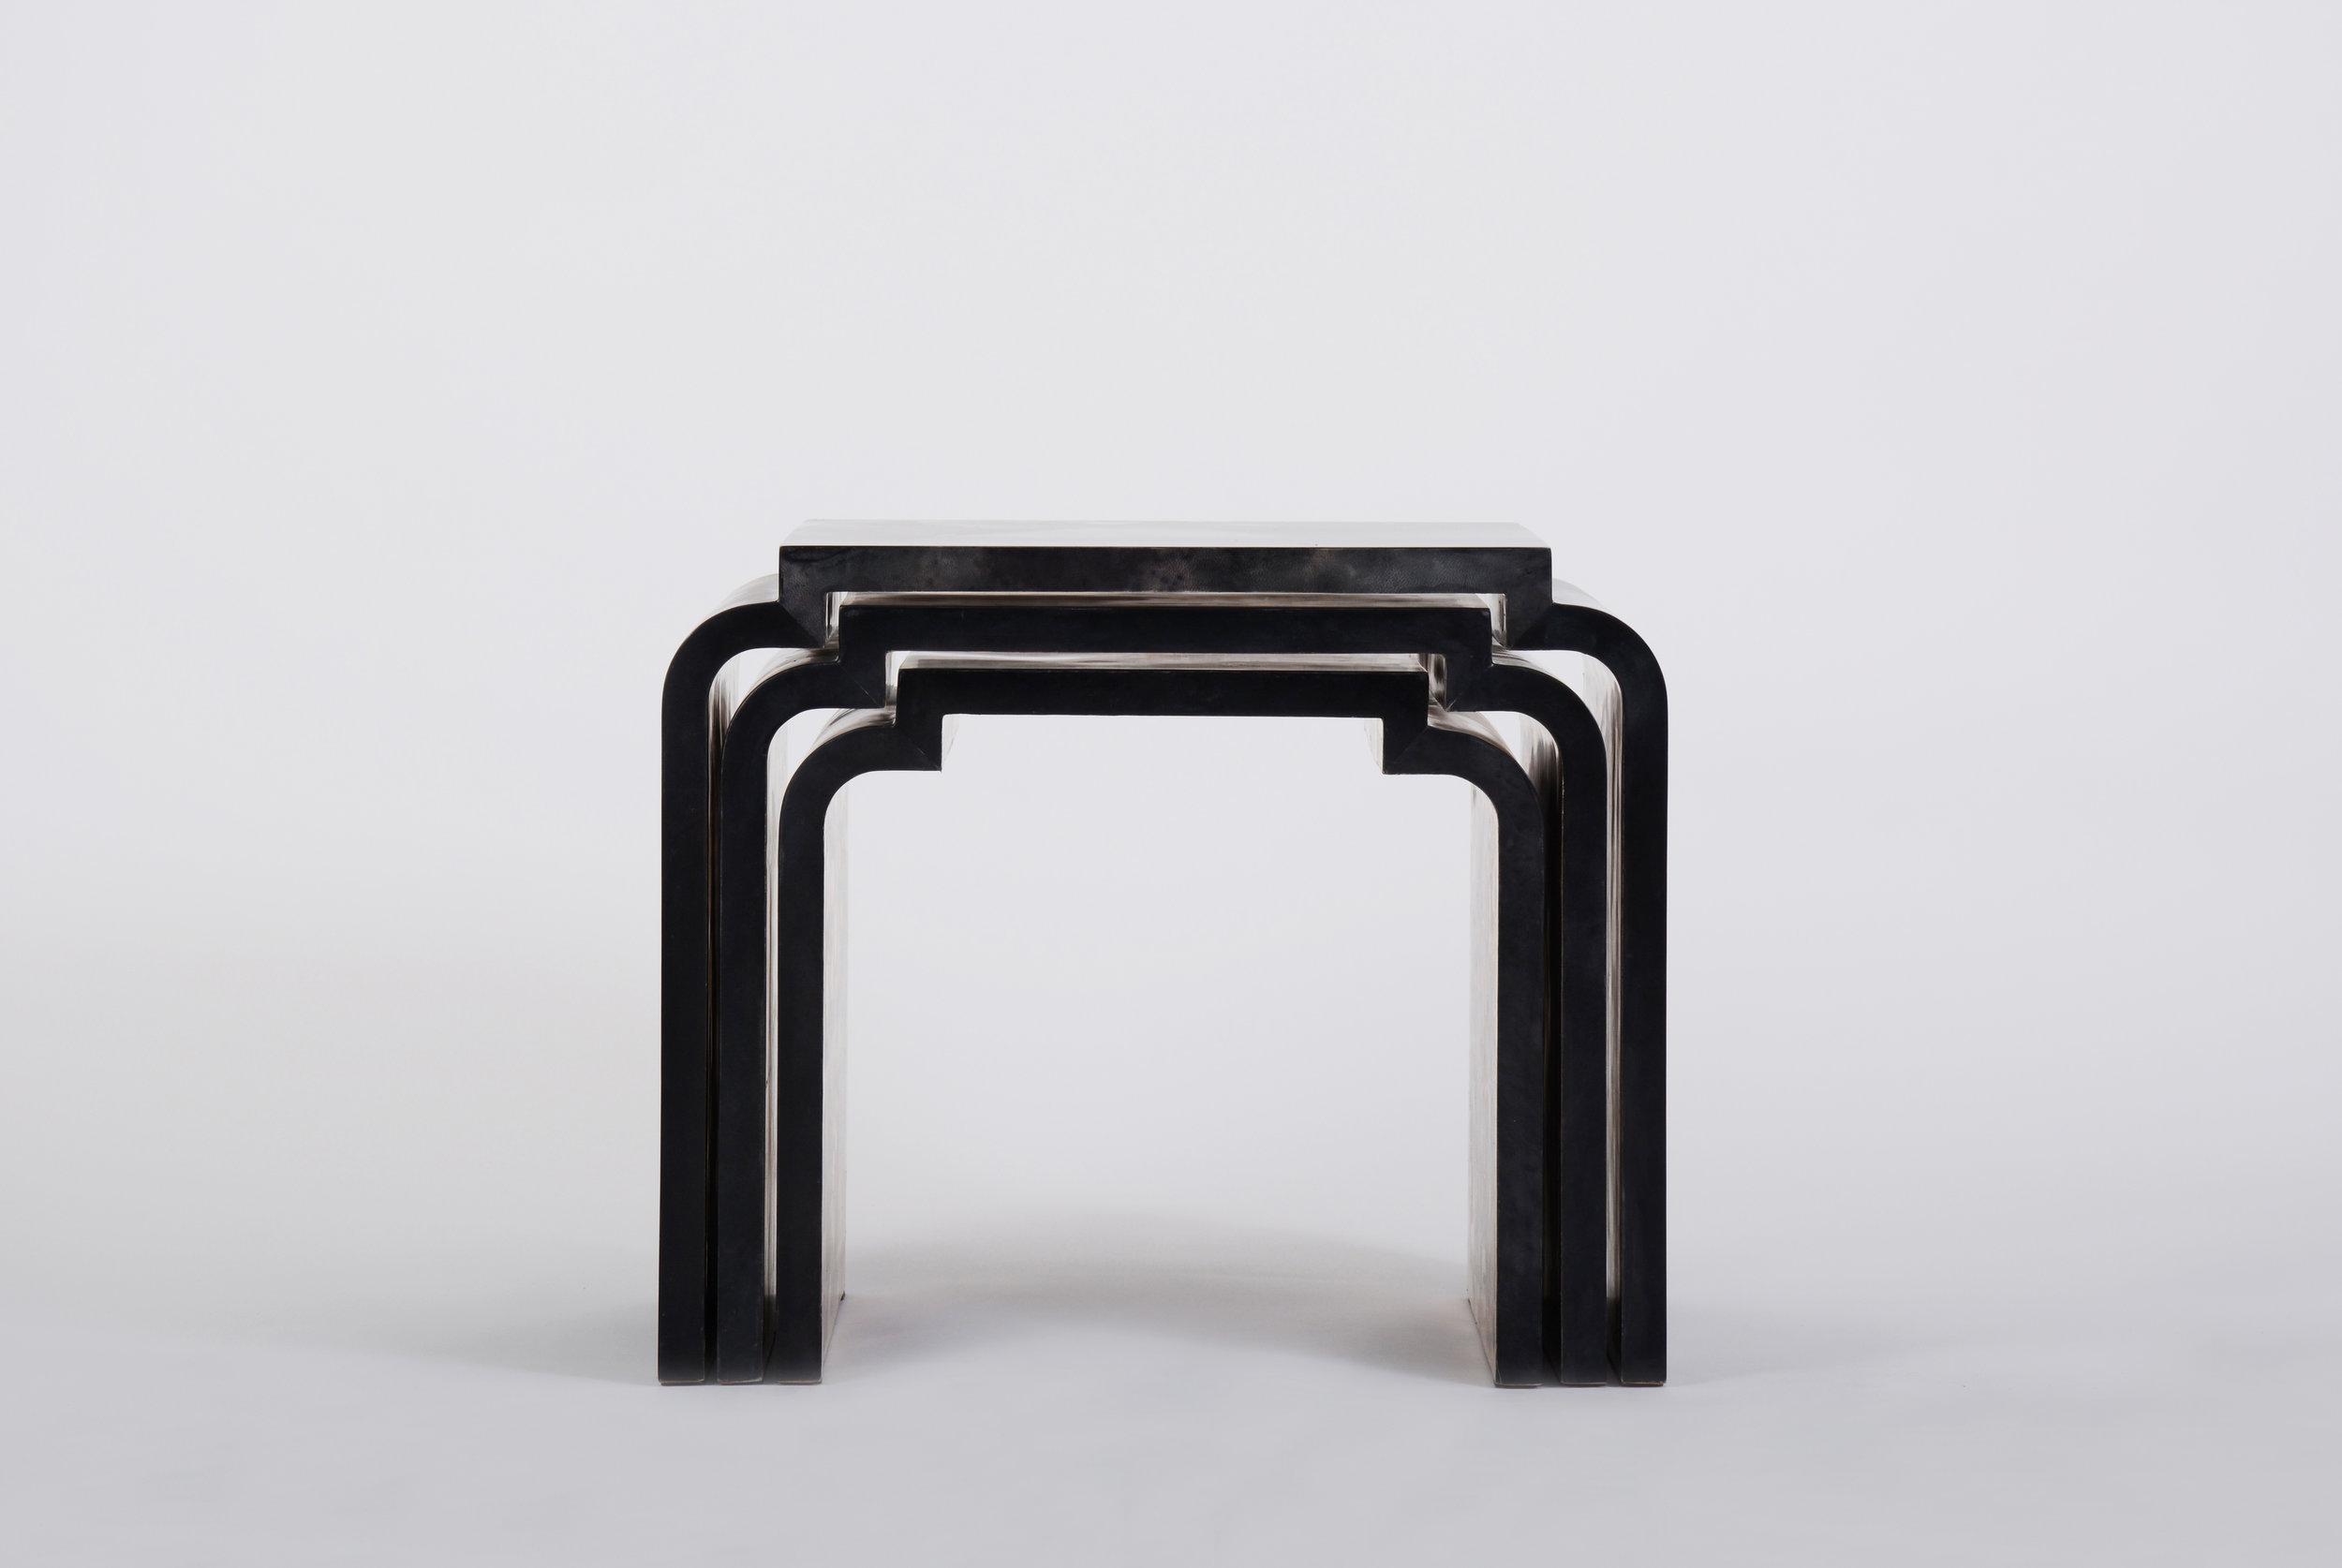 yuu nesting tables 1.JPG